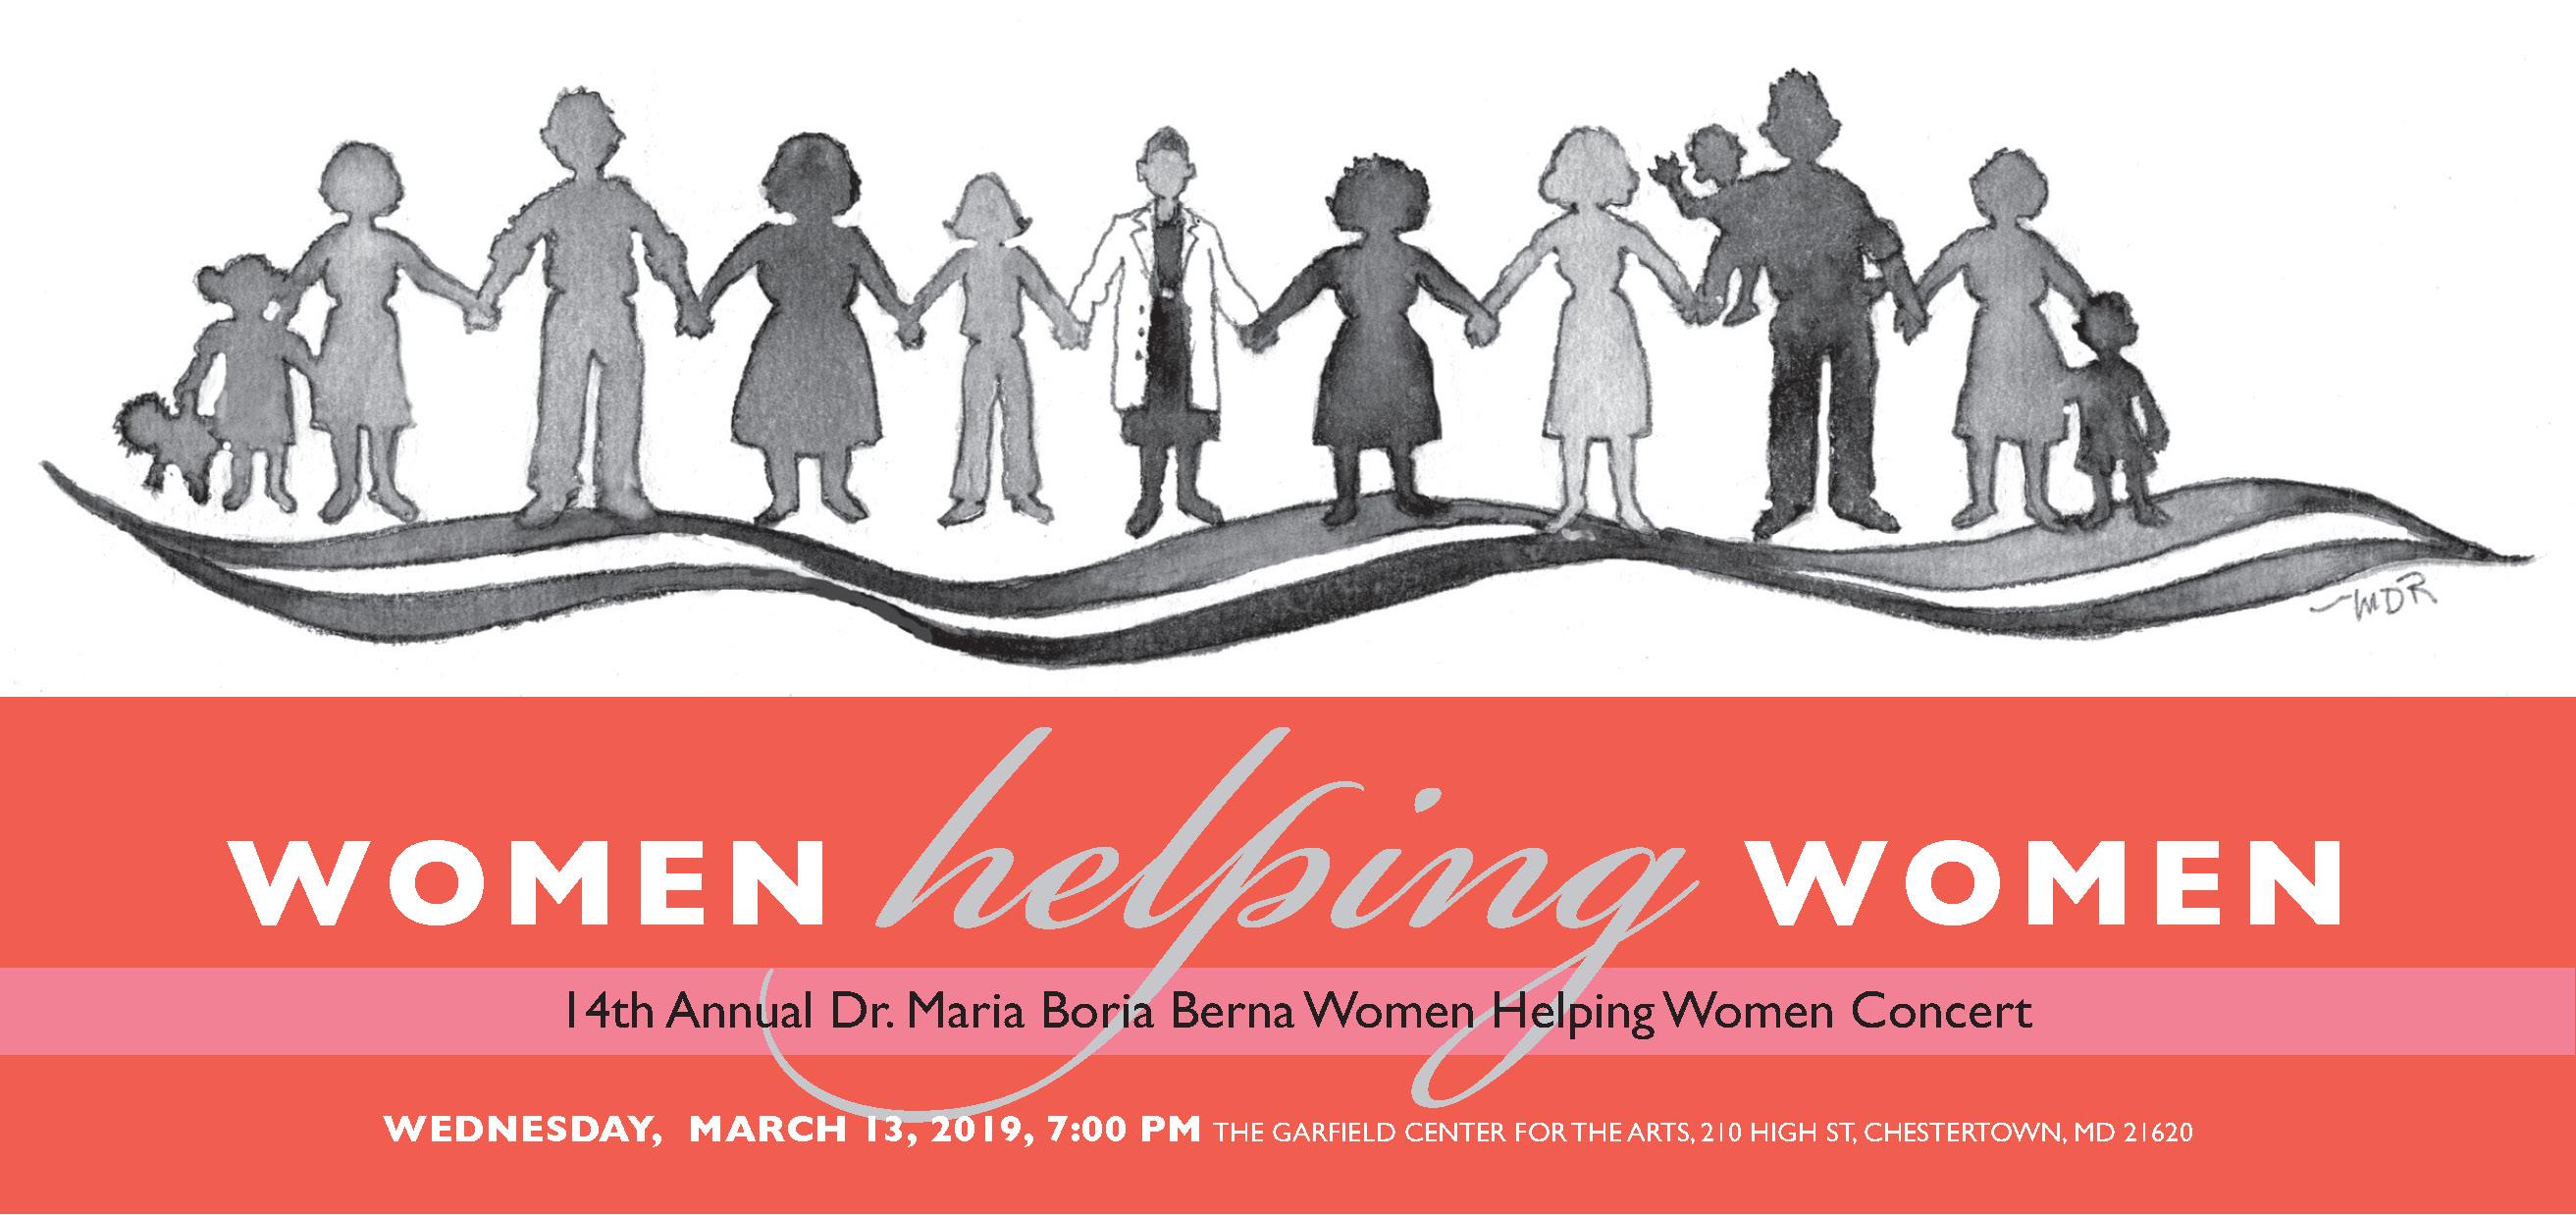 14th Annual Dr. Maria Boria Berna Women Helping Women Concert